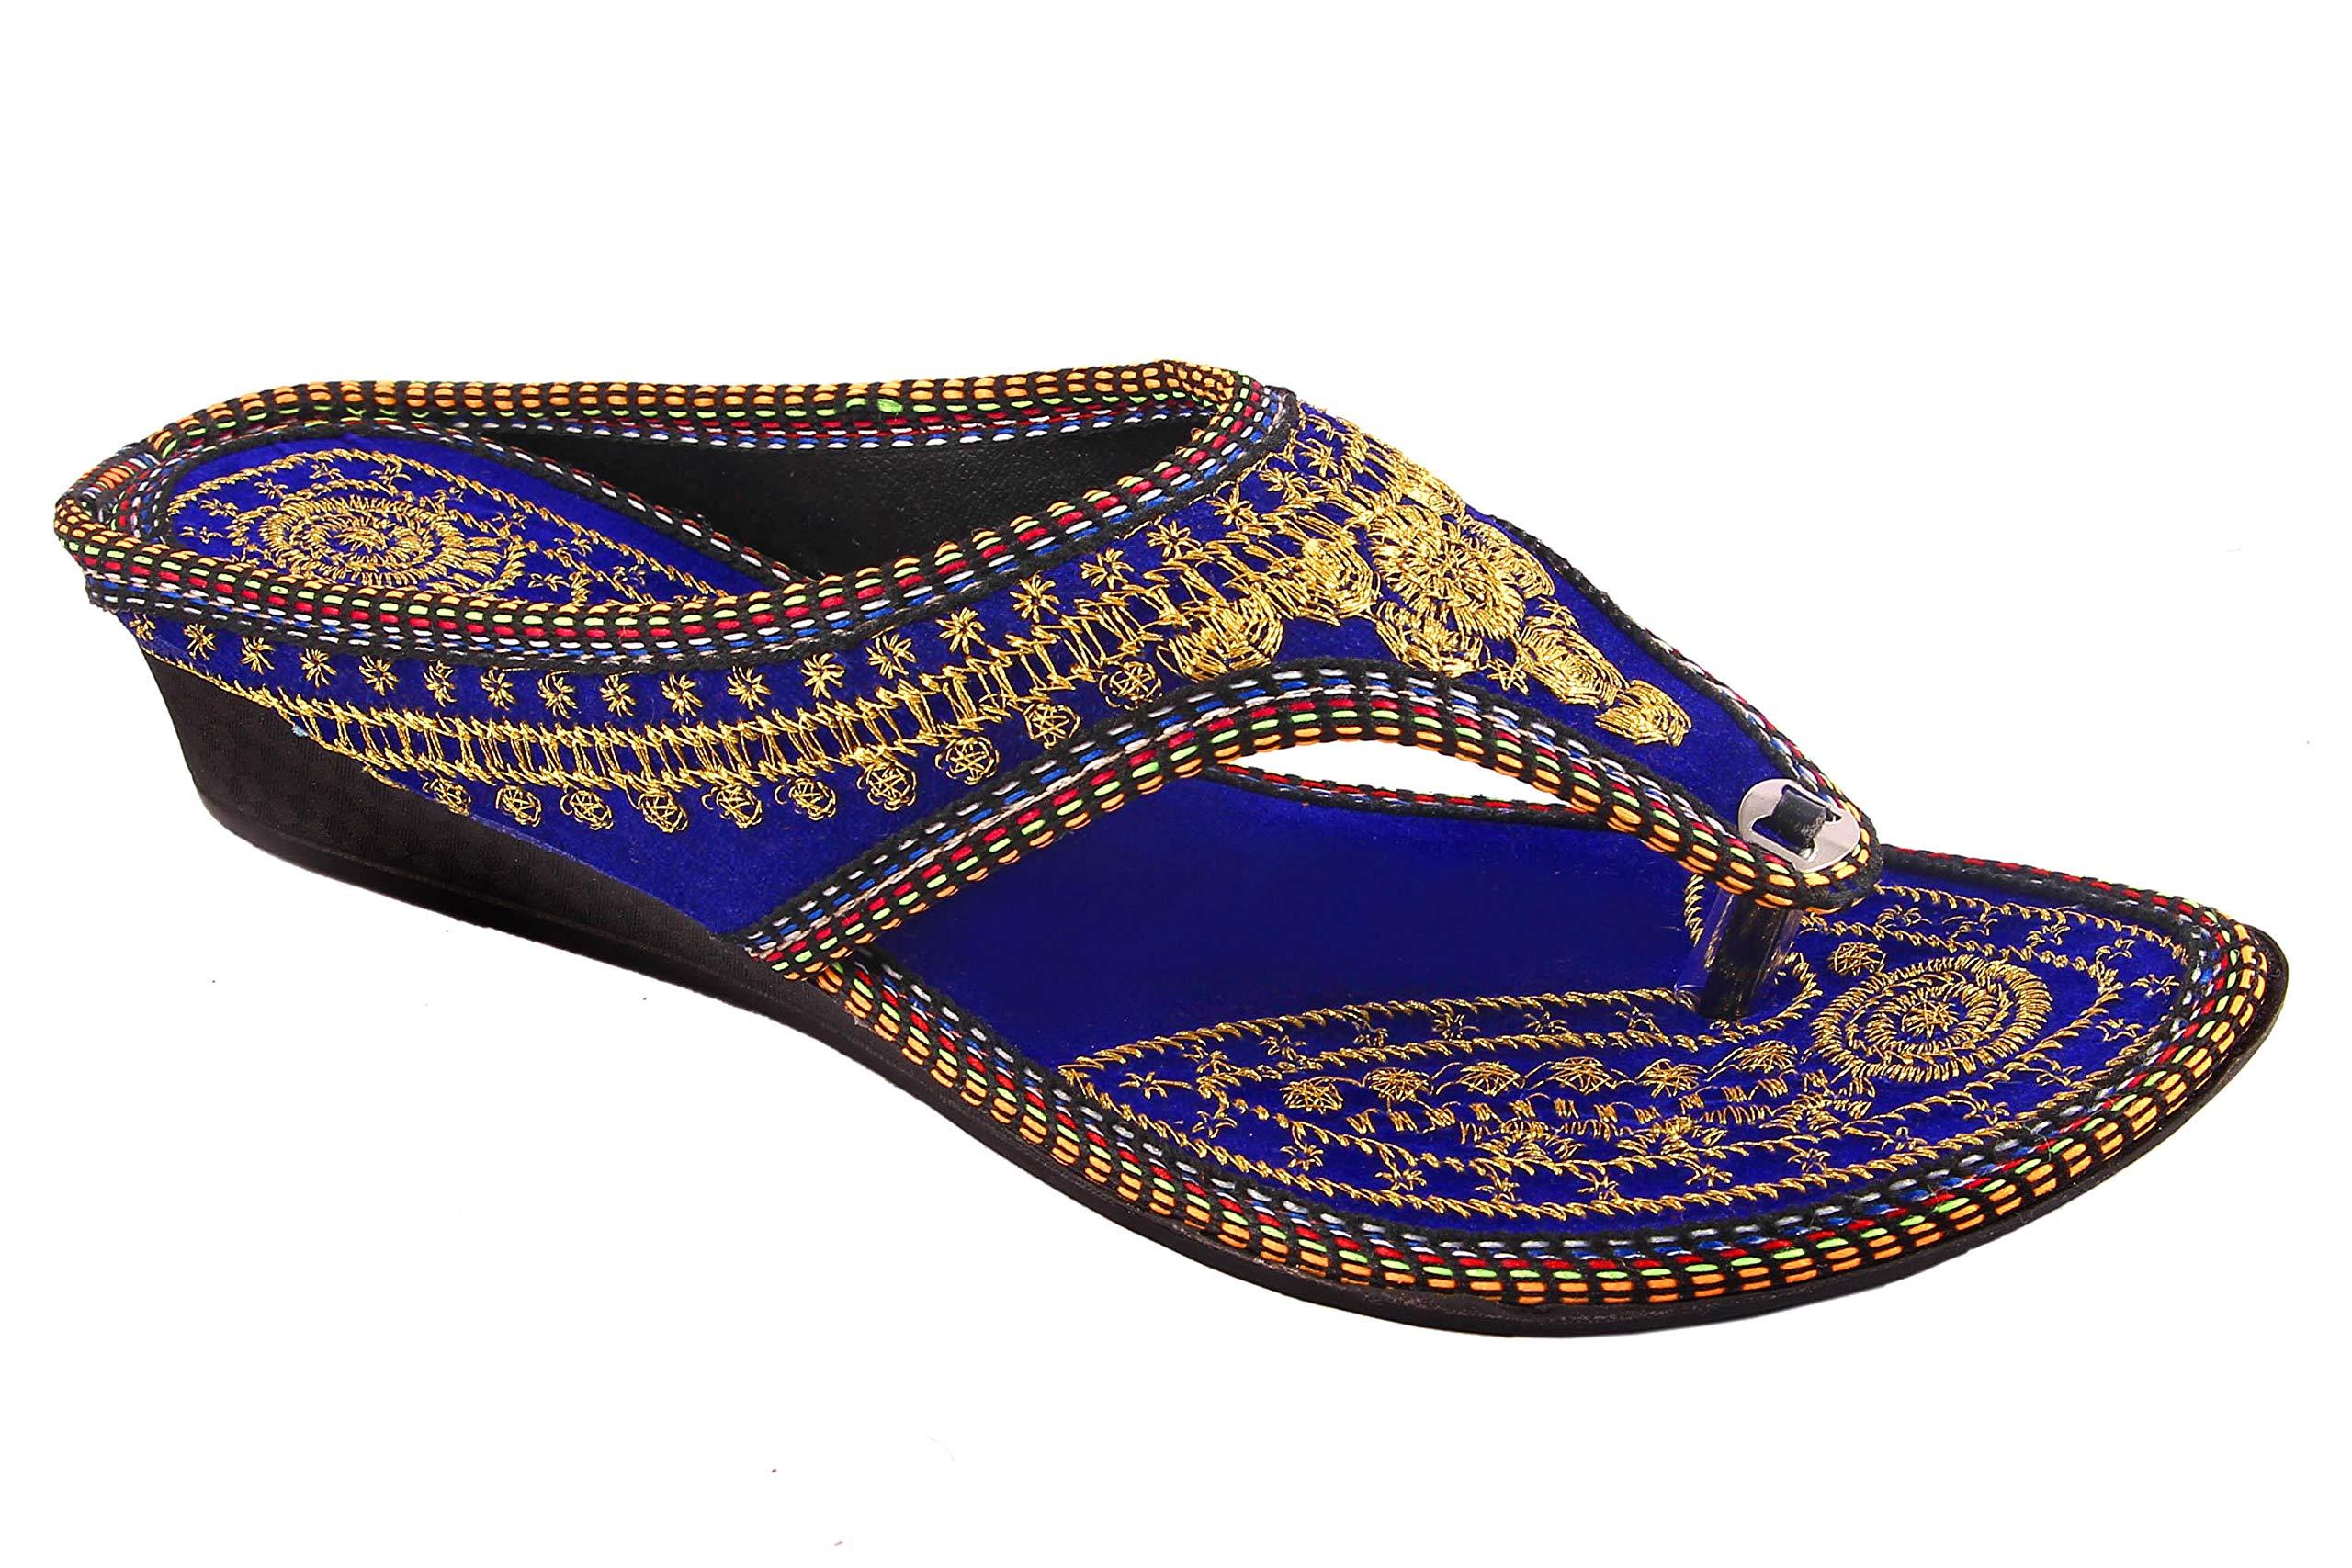 Beauty Craft Women's Blue Velvet Zari Embroidery Work Sandal Ind/UK-7 (B076VSHVK7) Amazon Price History, Amazon Price Tracker